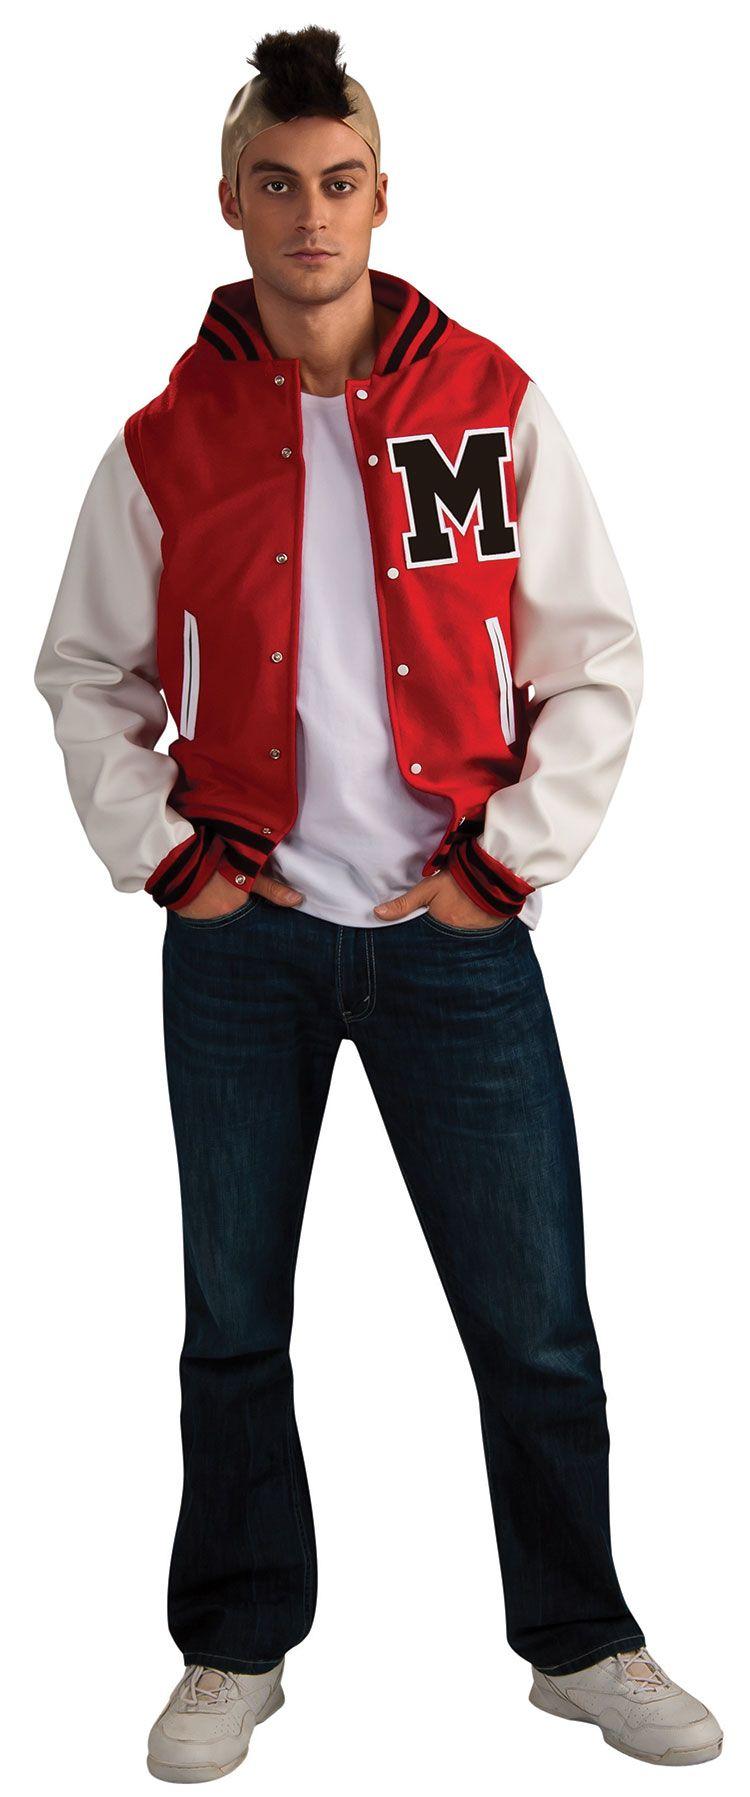 glee adult puck football player costume jacket 4999 tvstoreonlinewishlist - Puck Bunny Halloween Costume